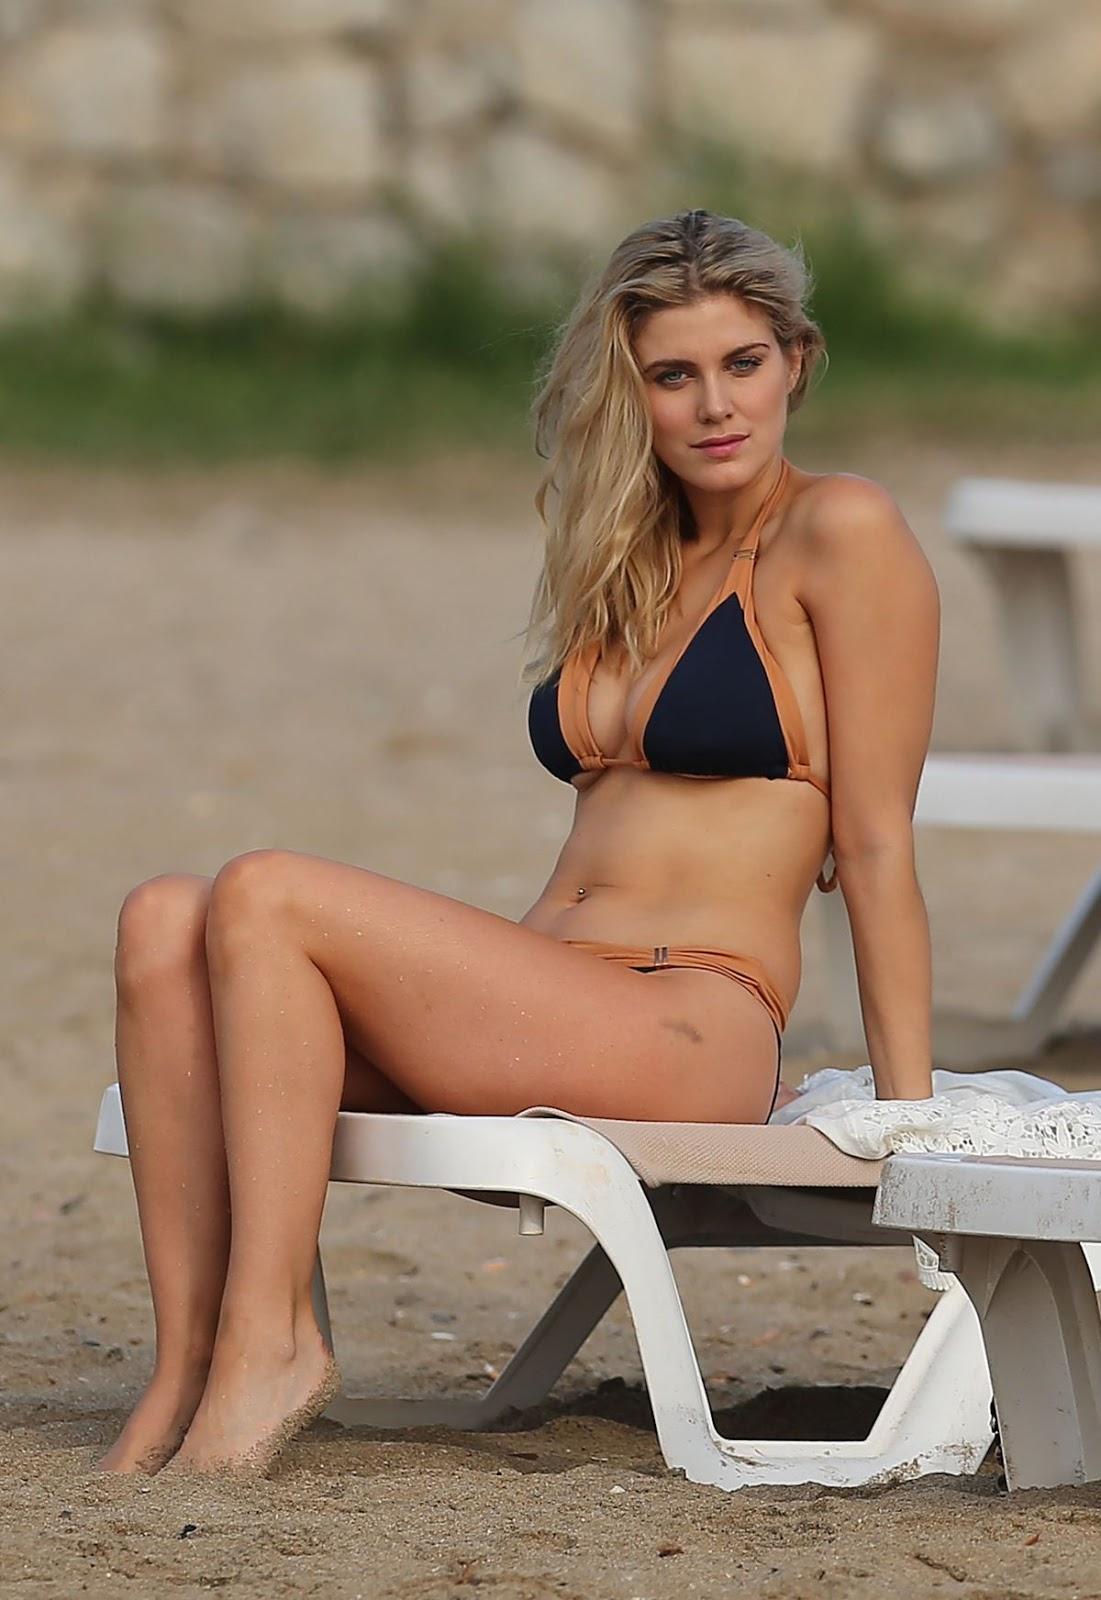 Ashley James in bikini